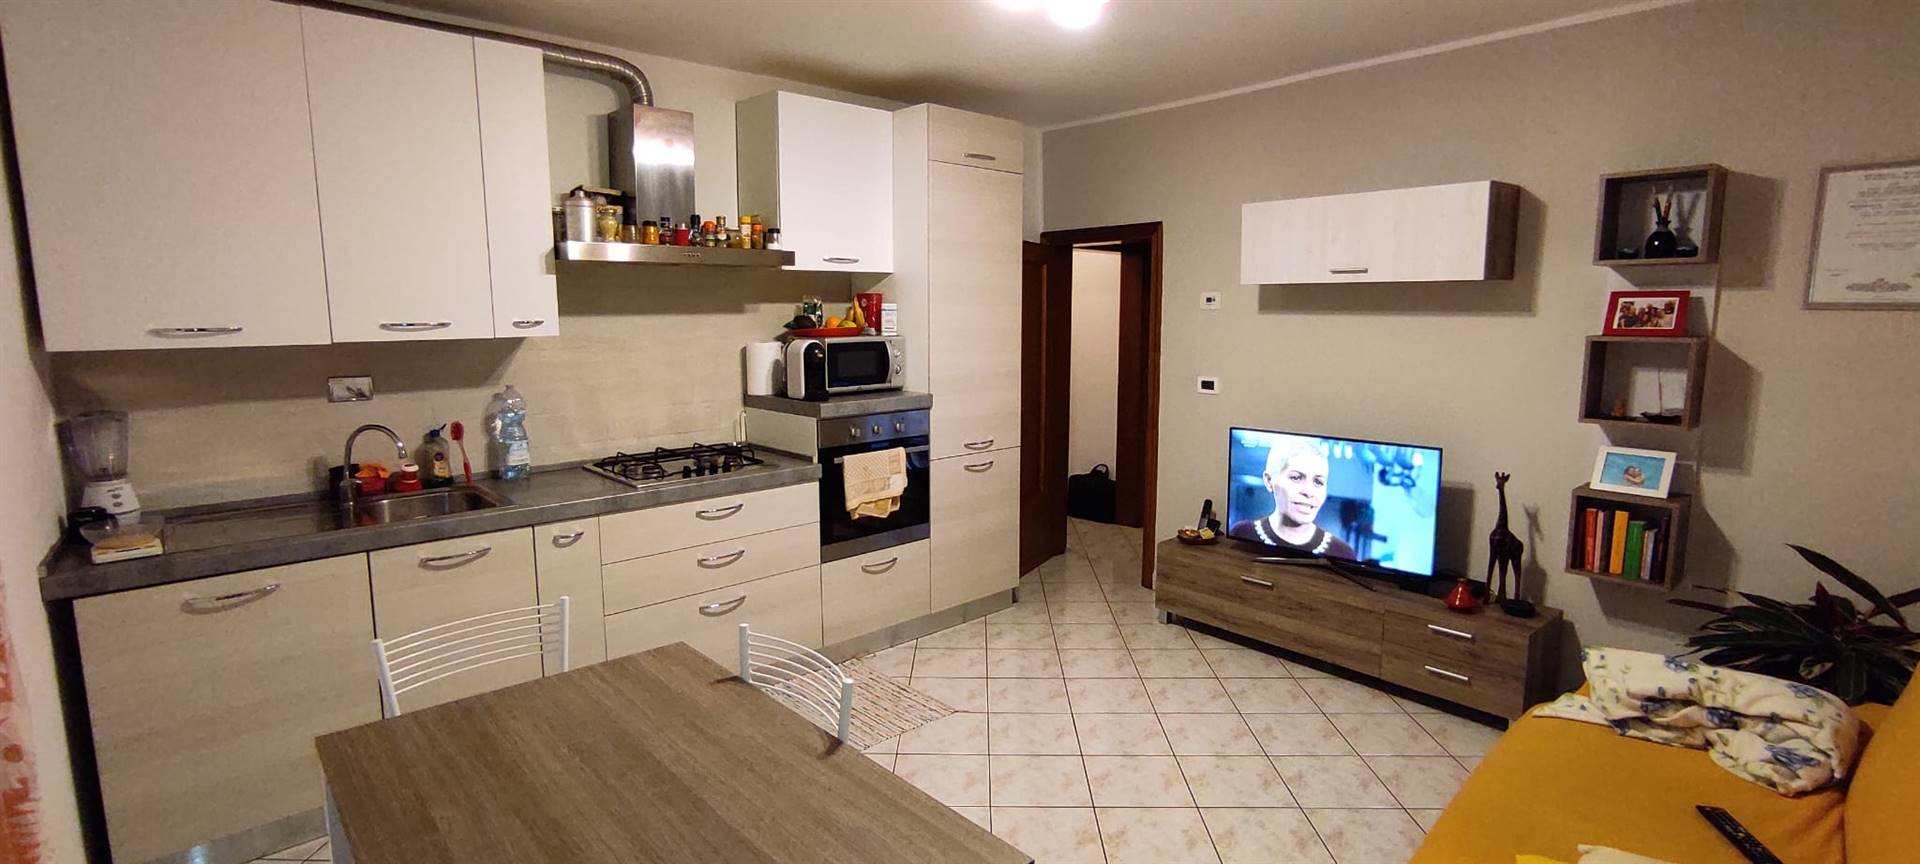 Appartamento a CARMIGNANO